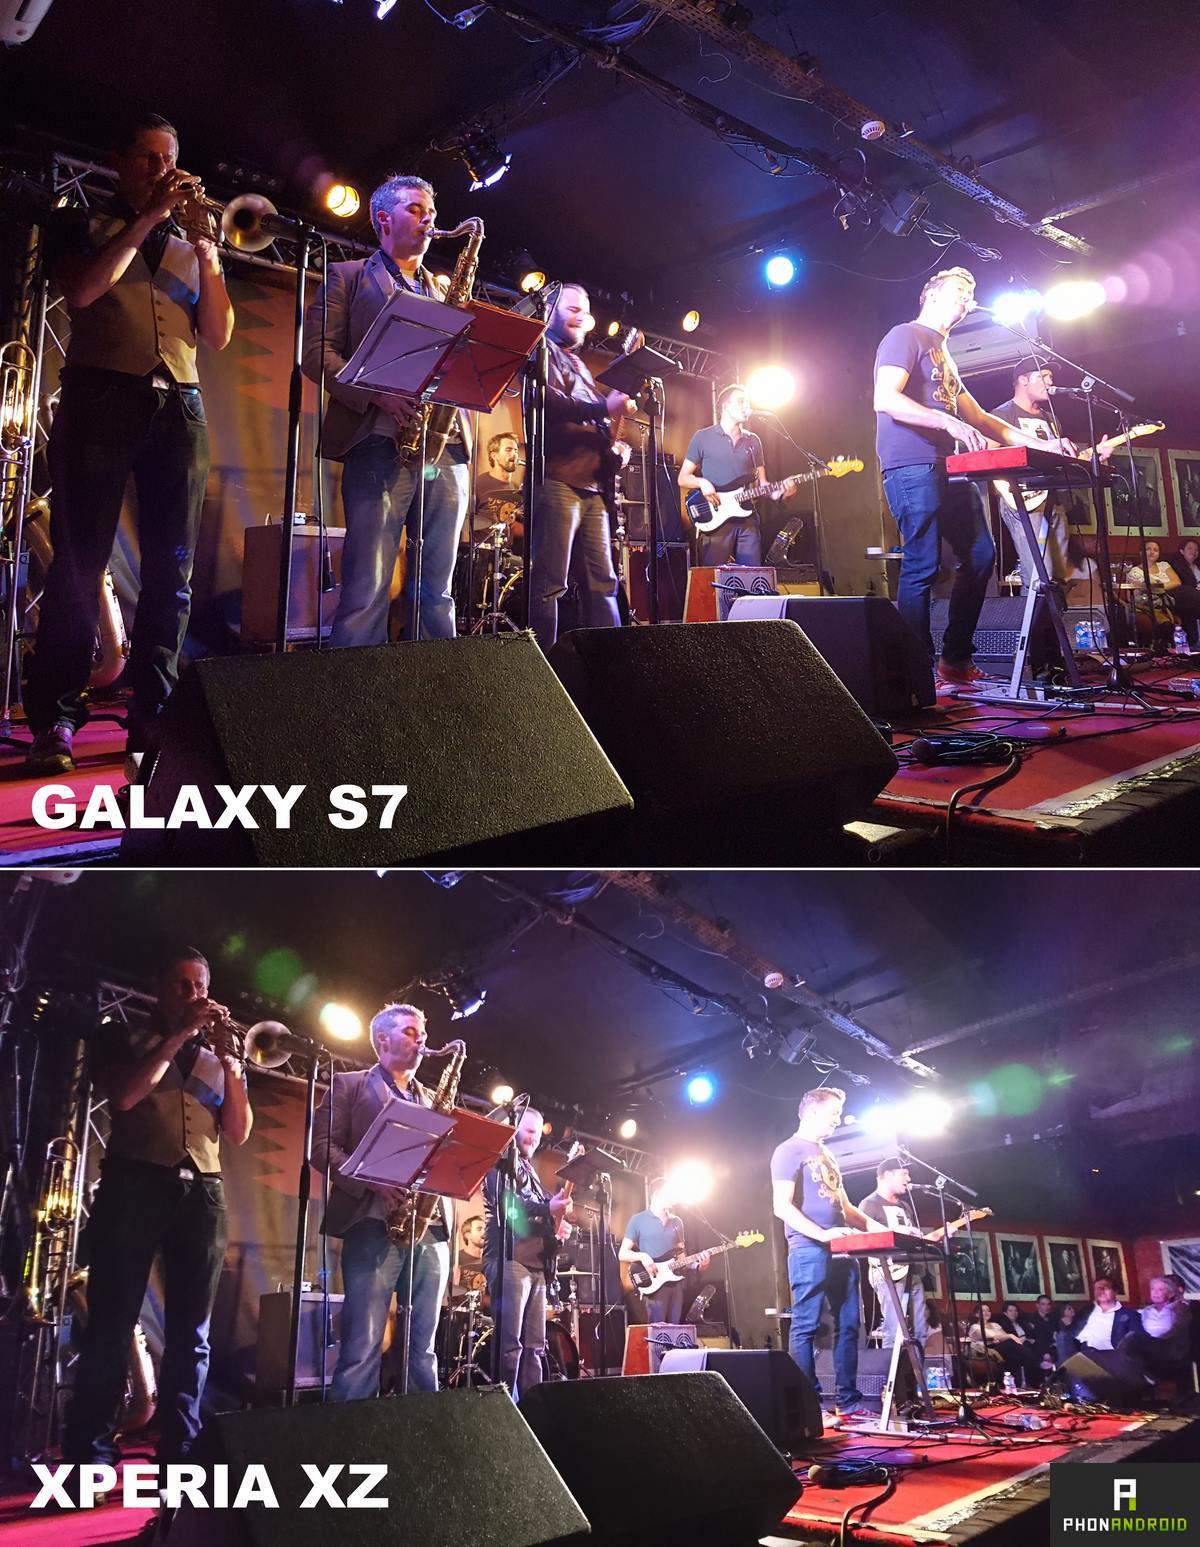 photo galaxy s7 sony xperia xz